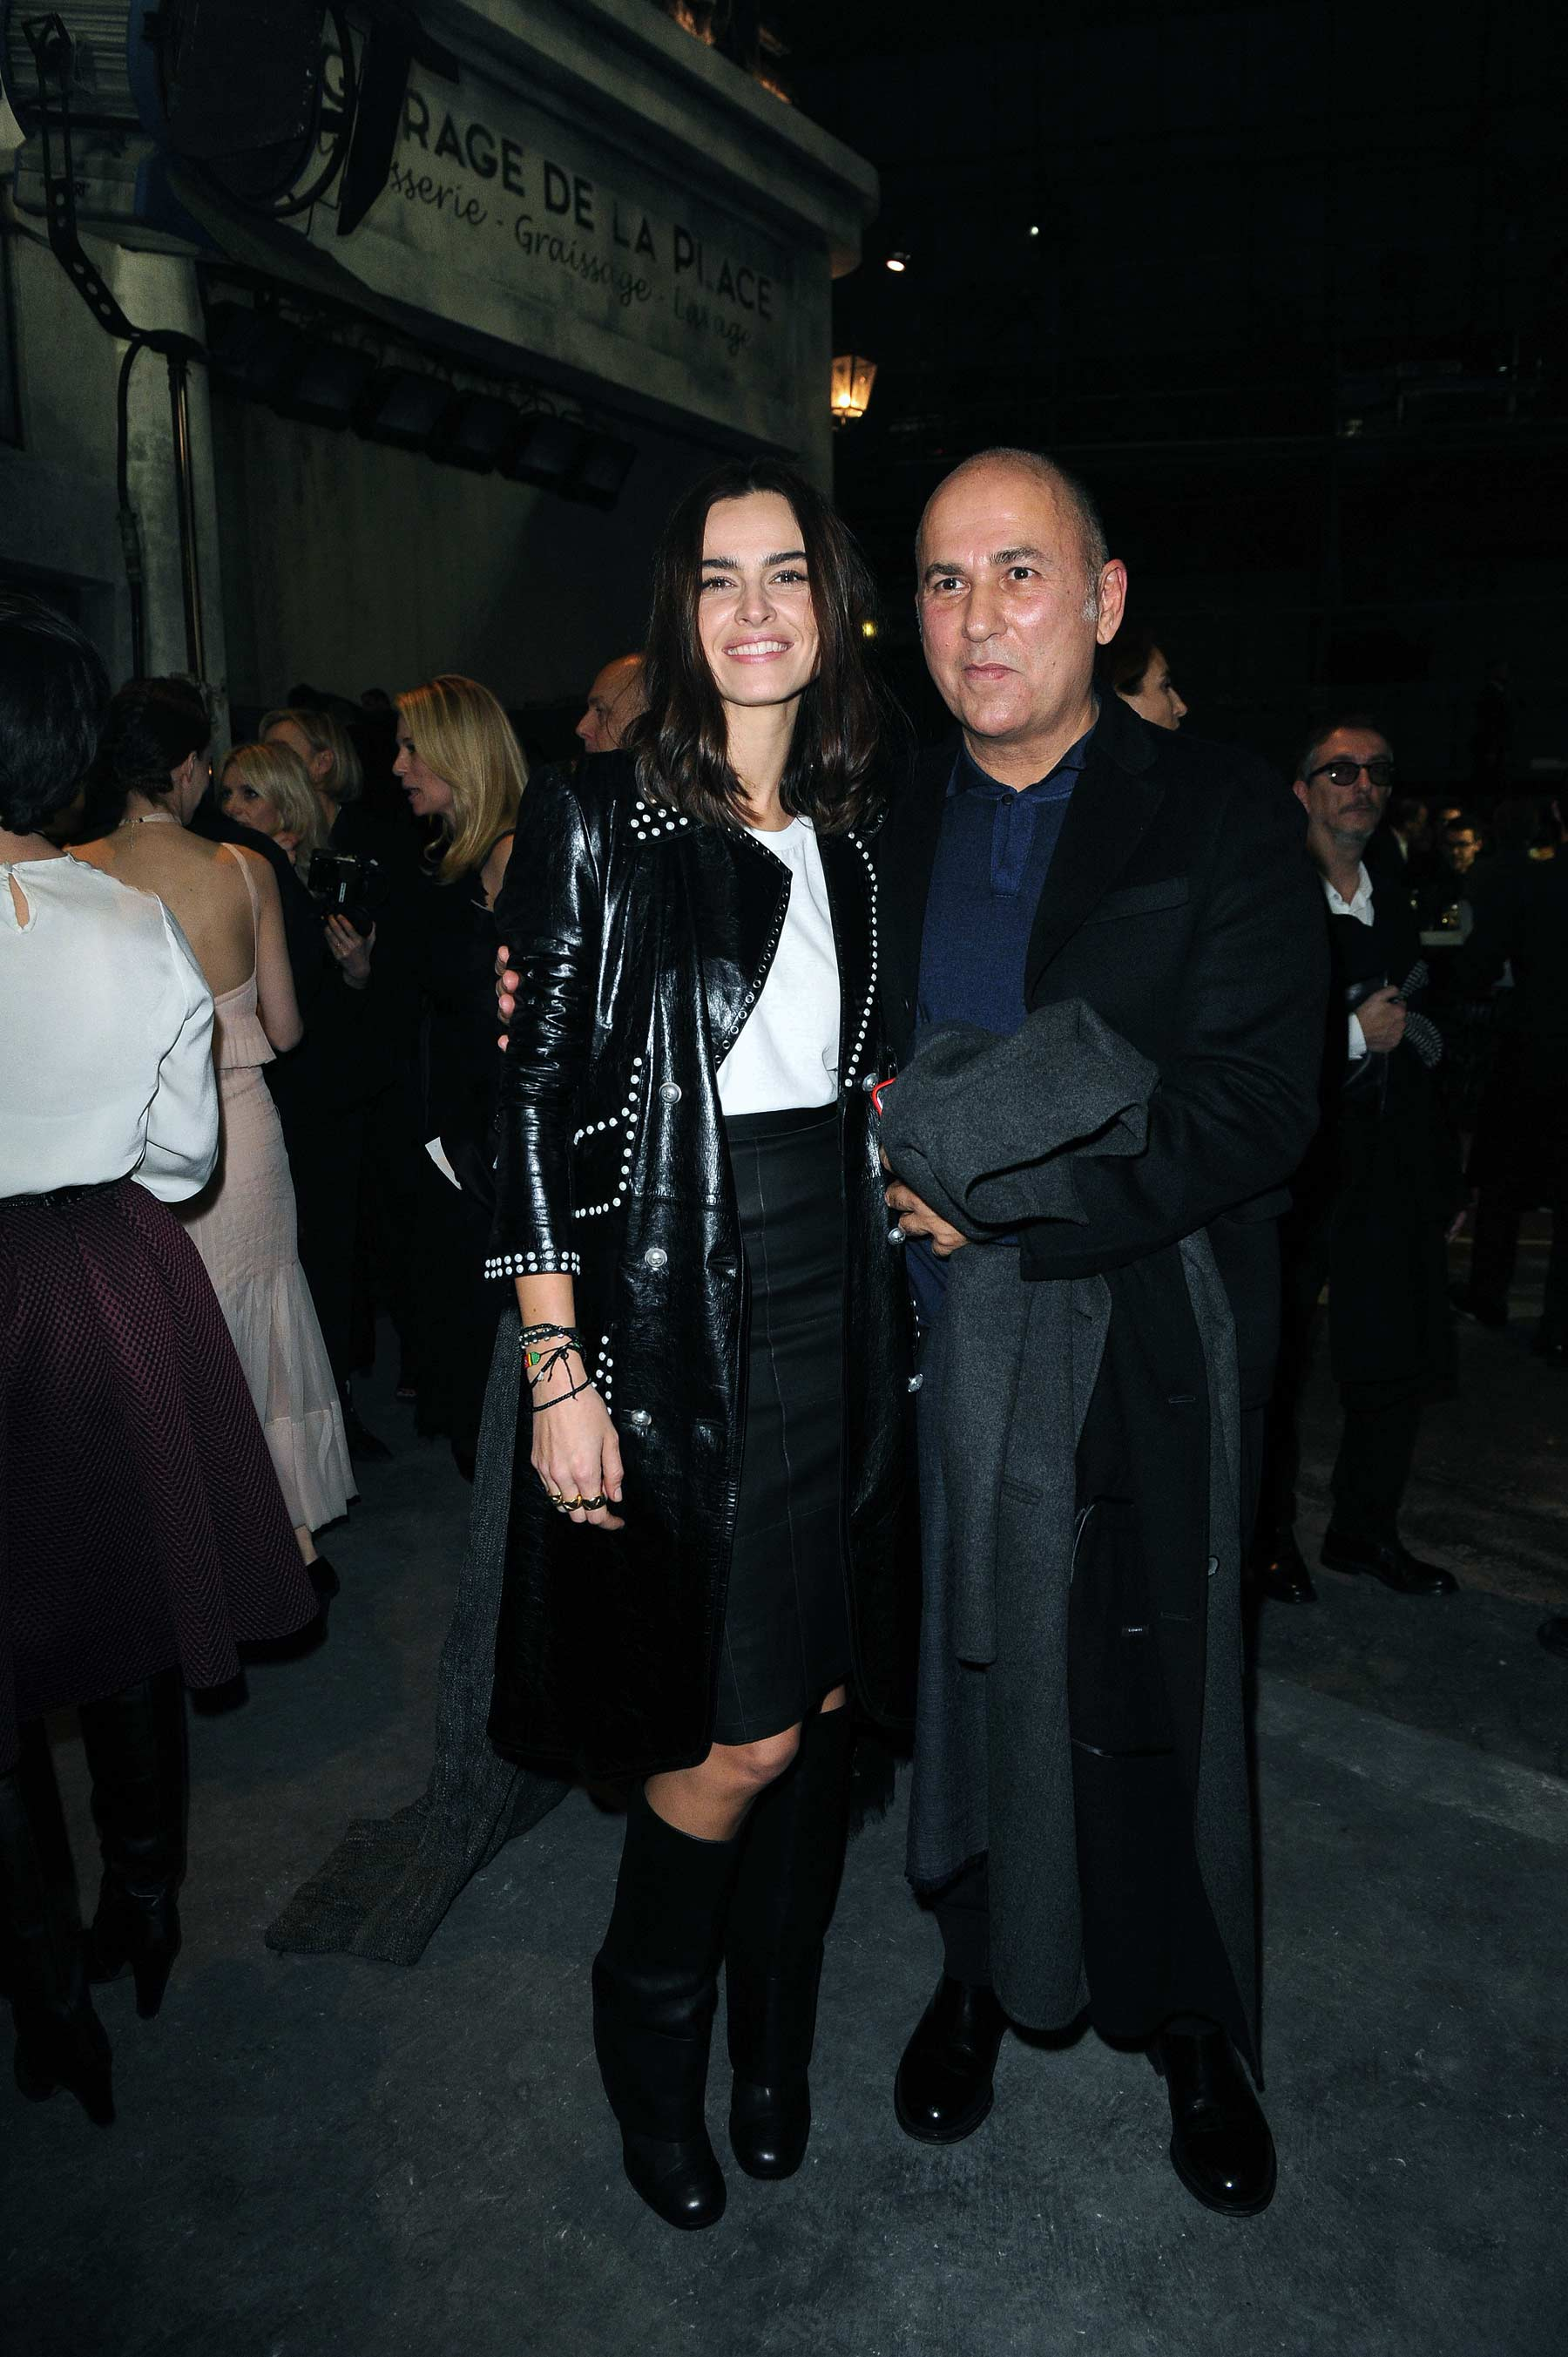 Kasia Smutniak attends Chanel Metiers d'Art 2015/16 Fashion Show